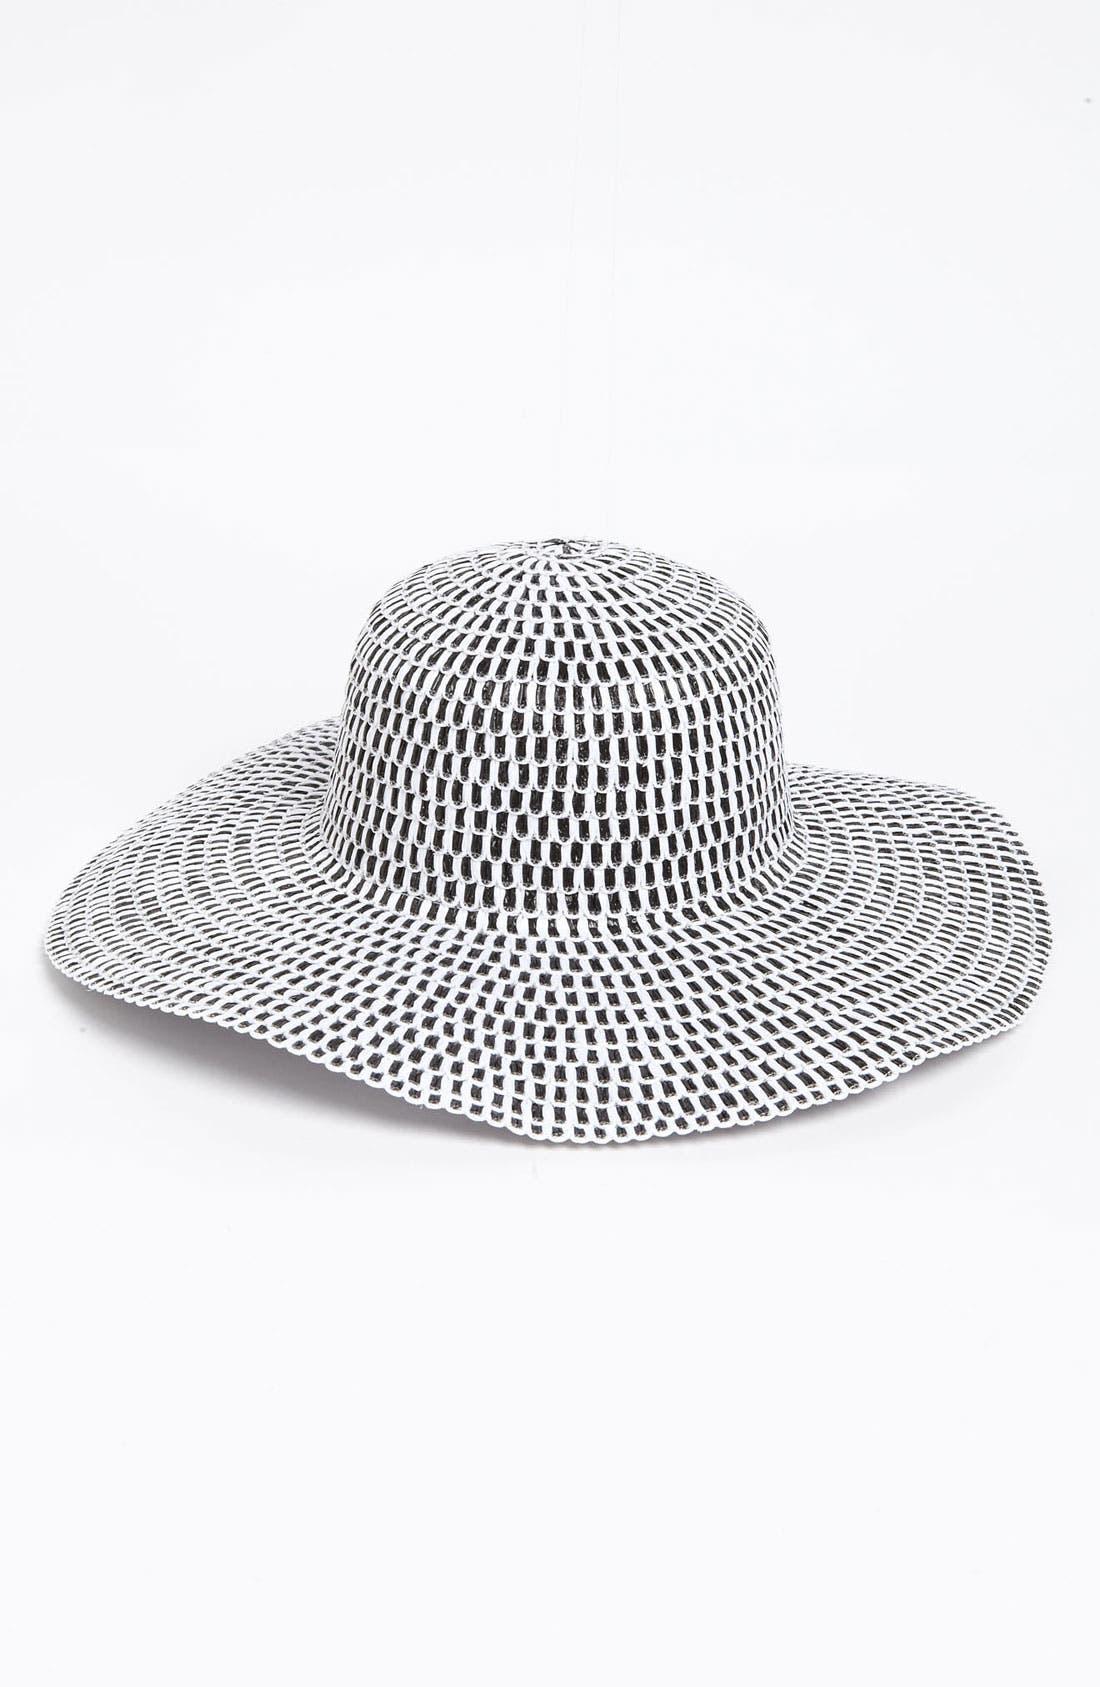 Main Image - Nordstrom 'Gingham' Sun Hat